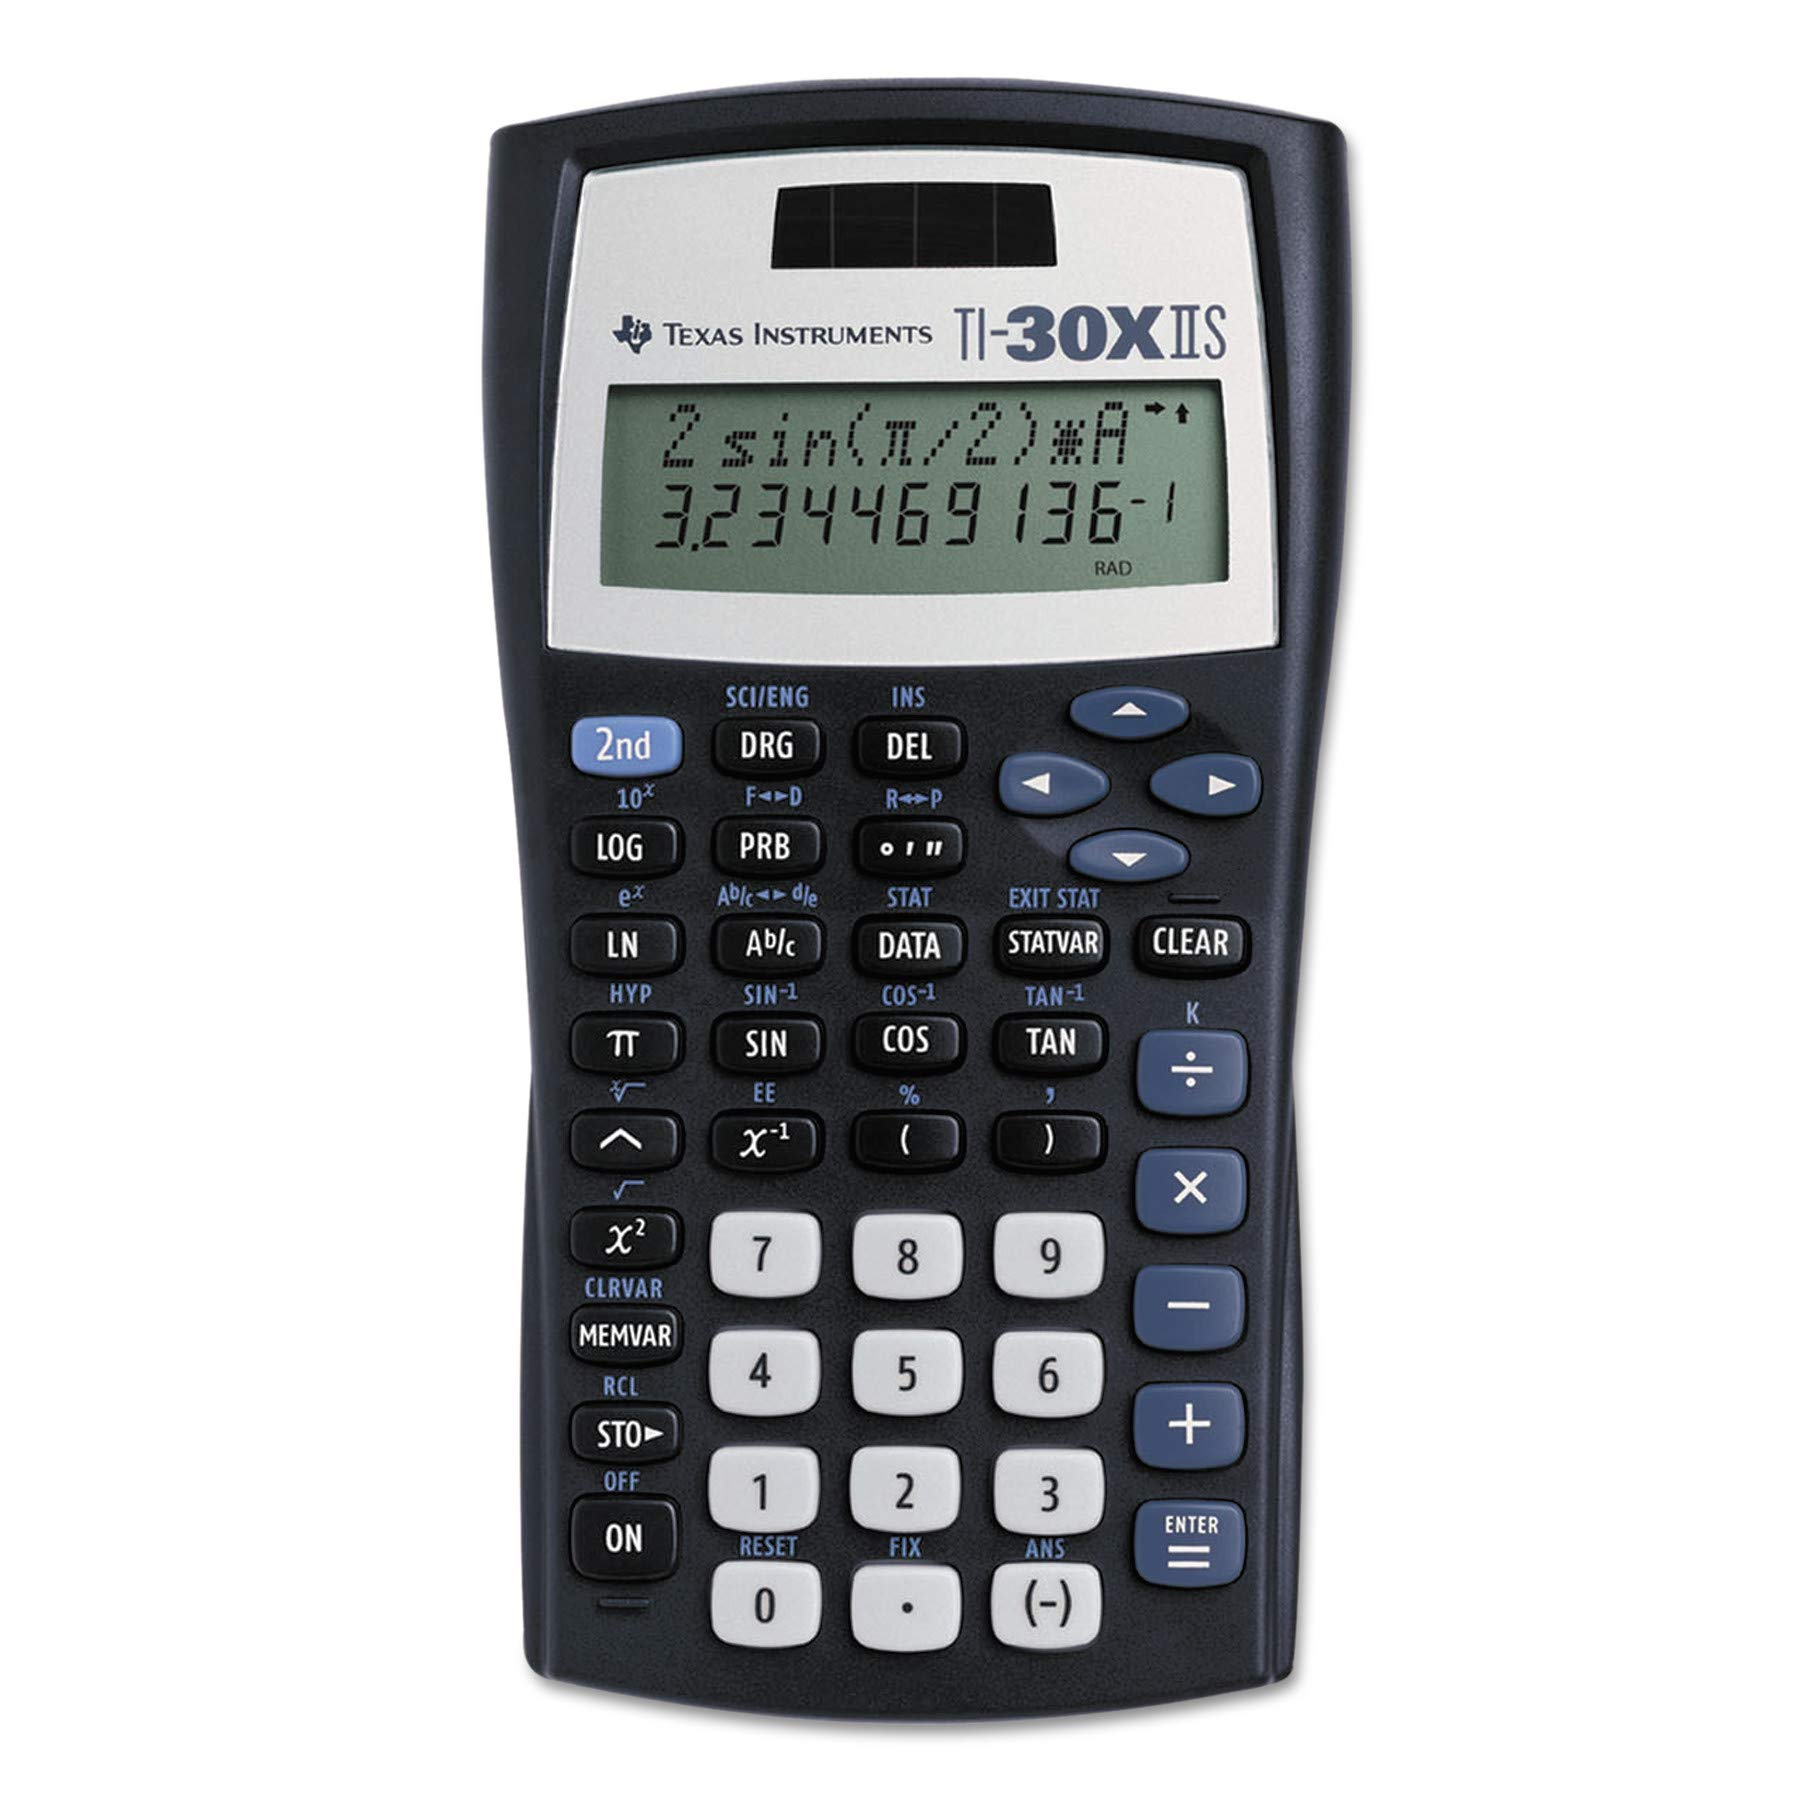 Texas Instruments TI-30X IIS Scientific Calculator - Black